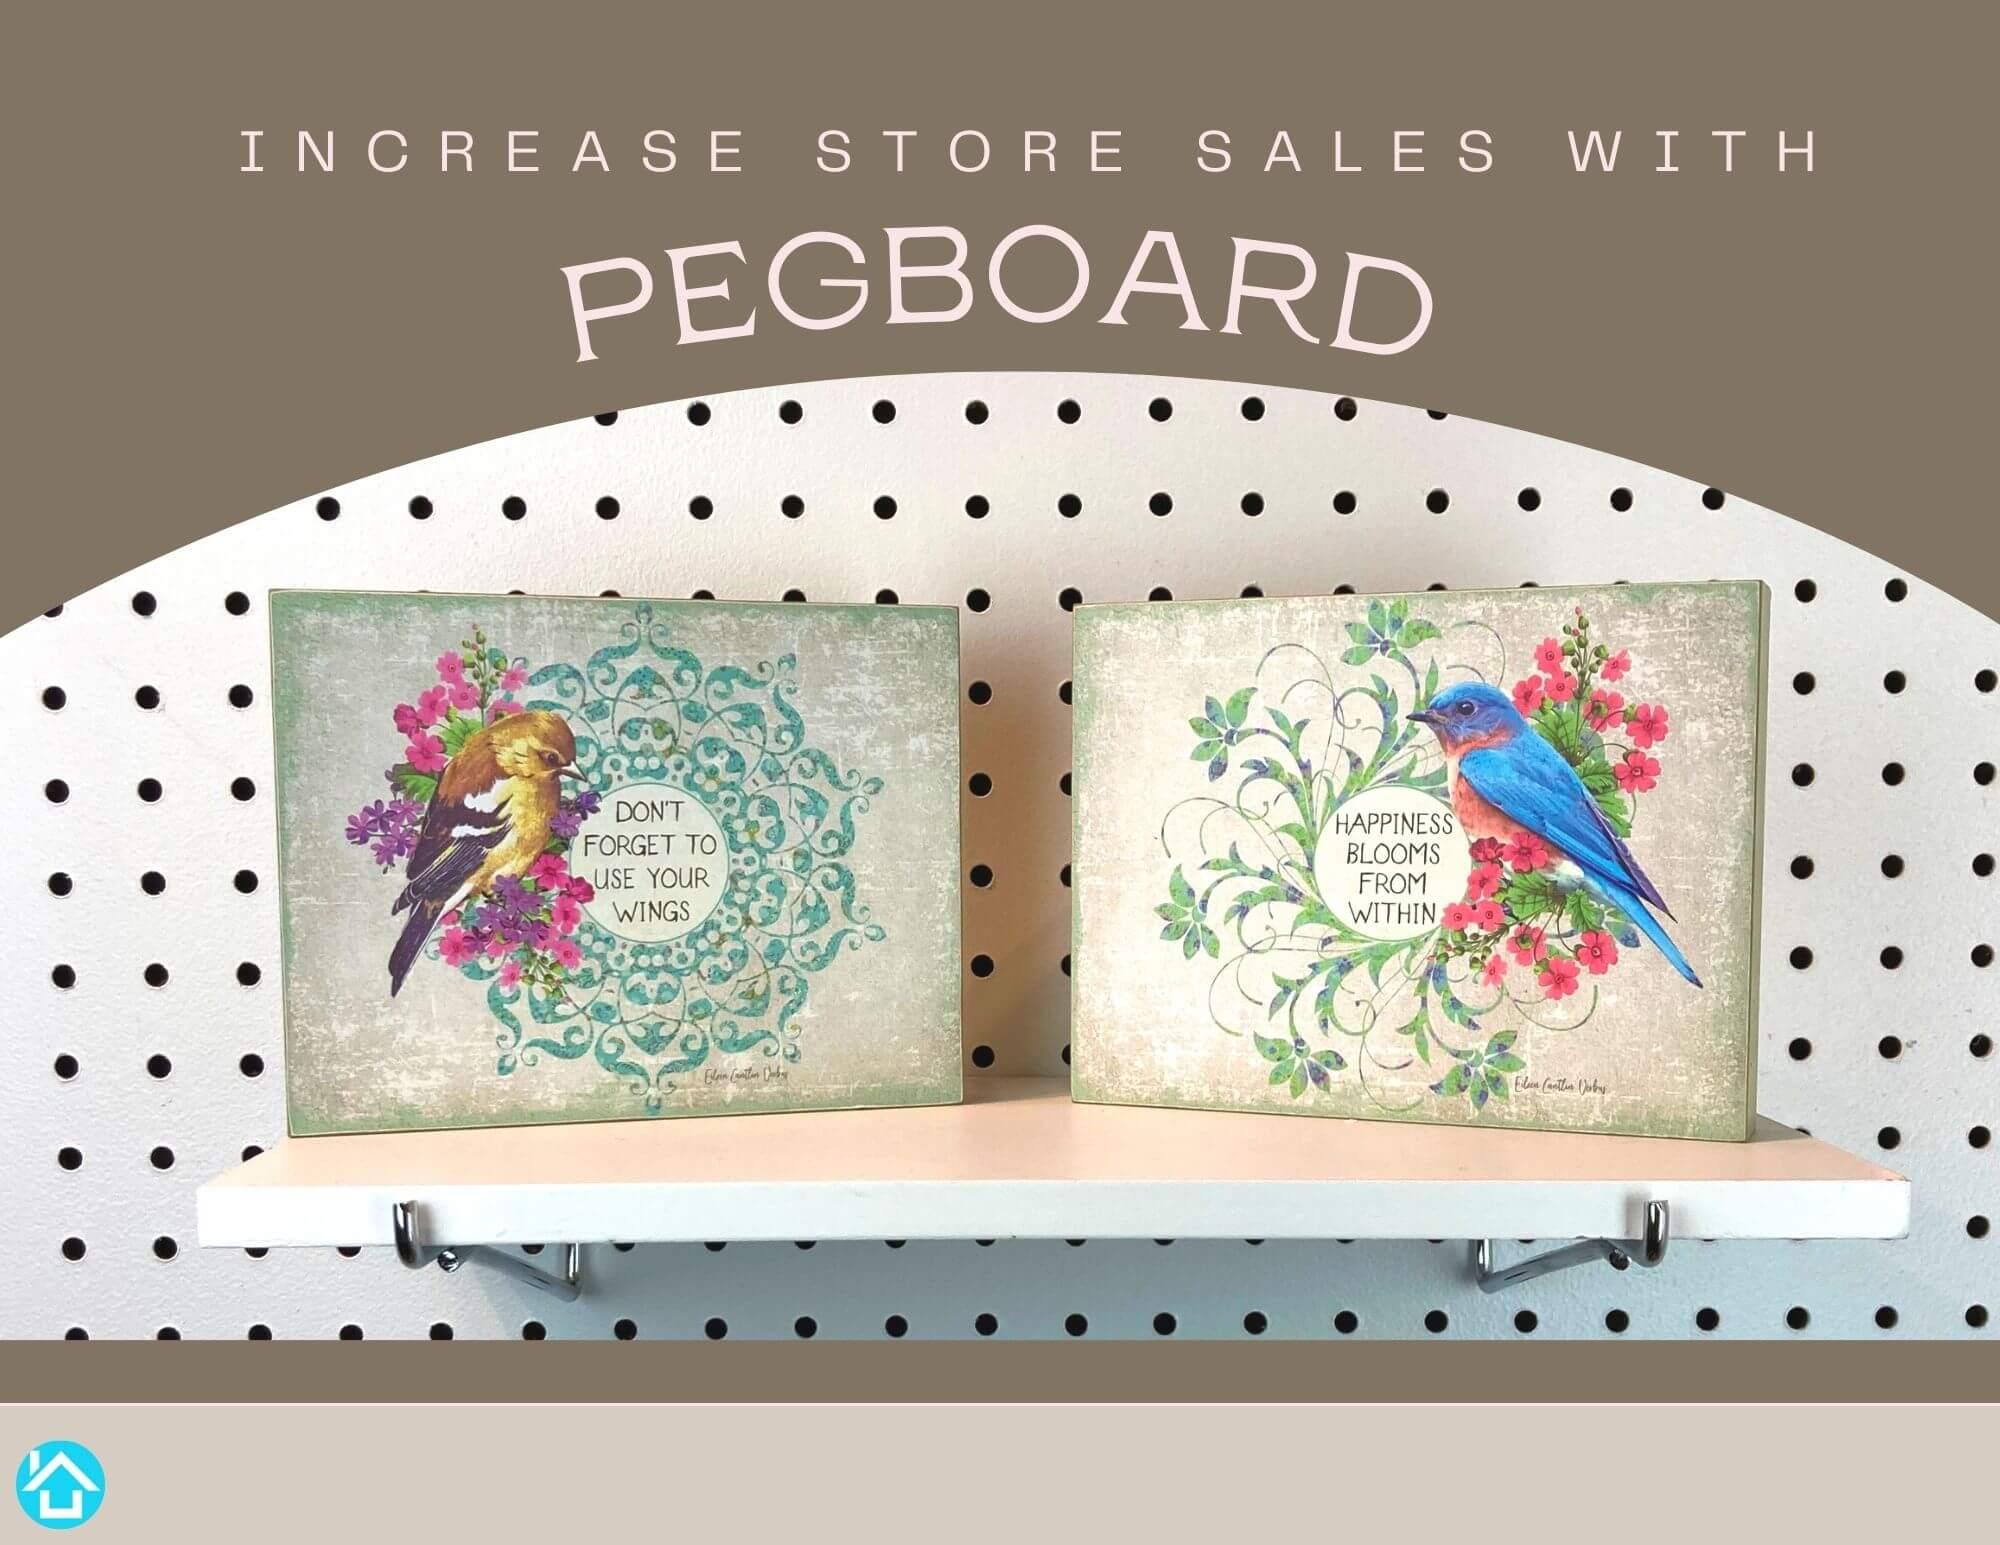 Pegboard Retail Display